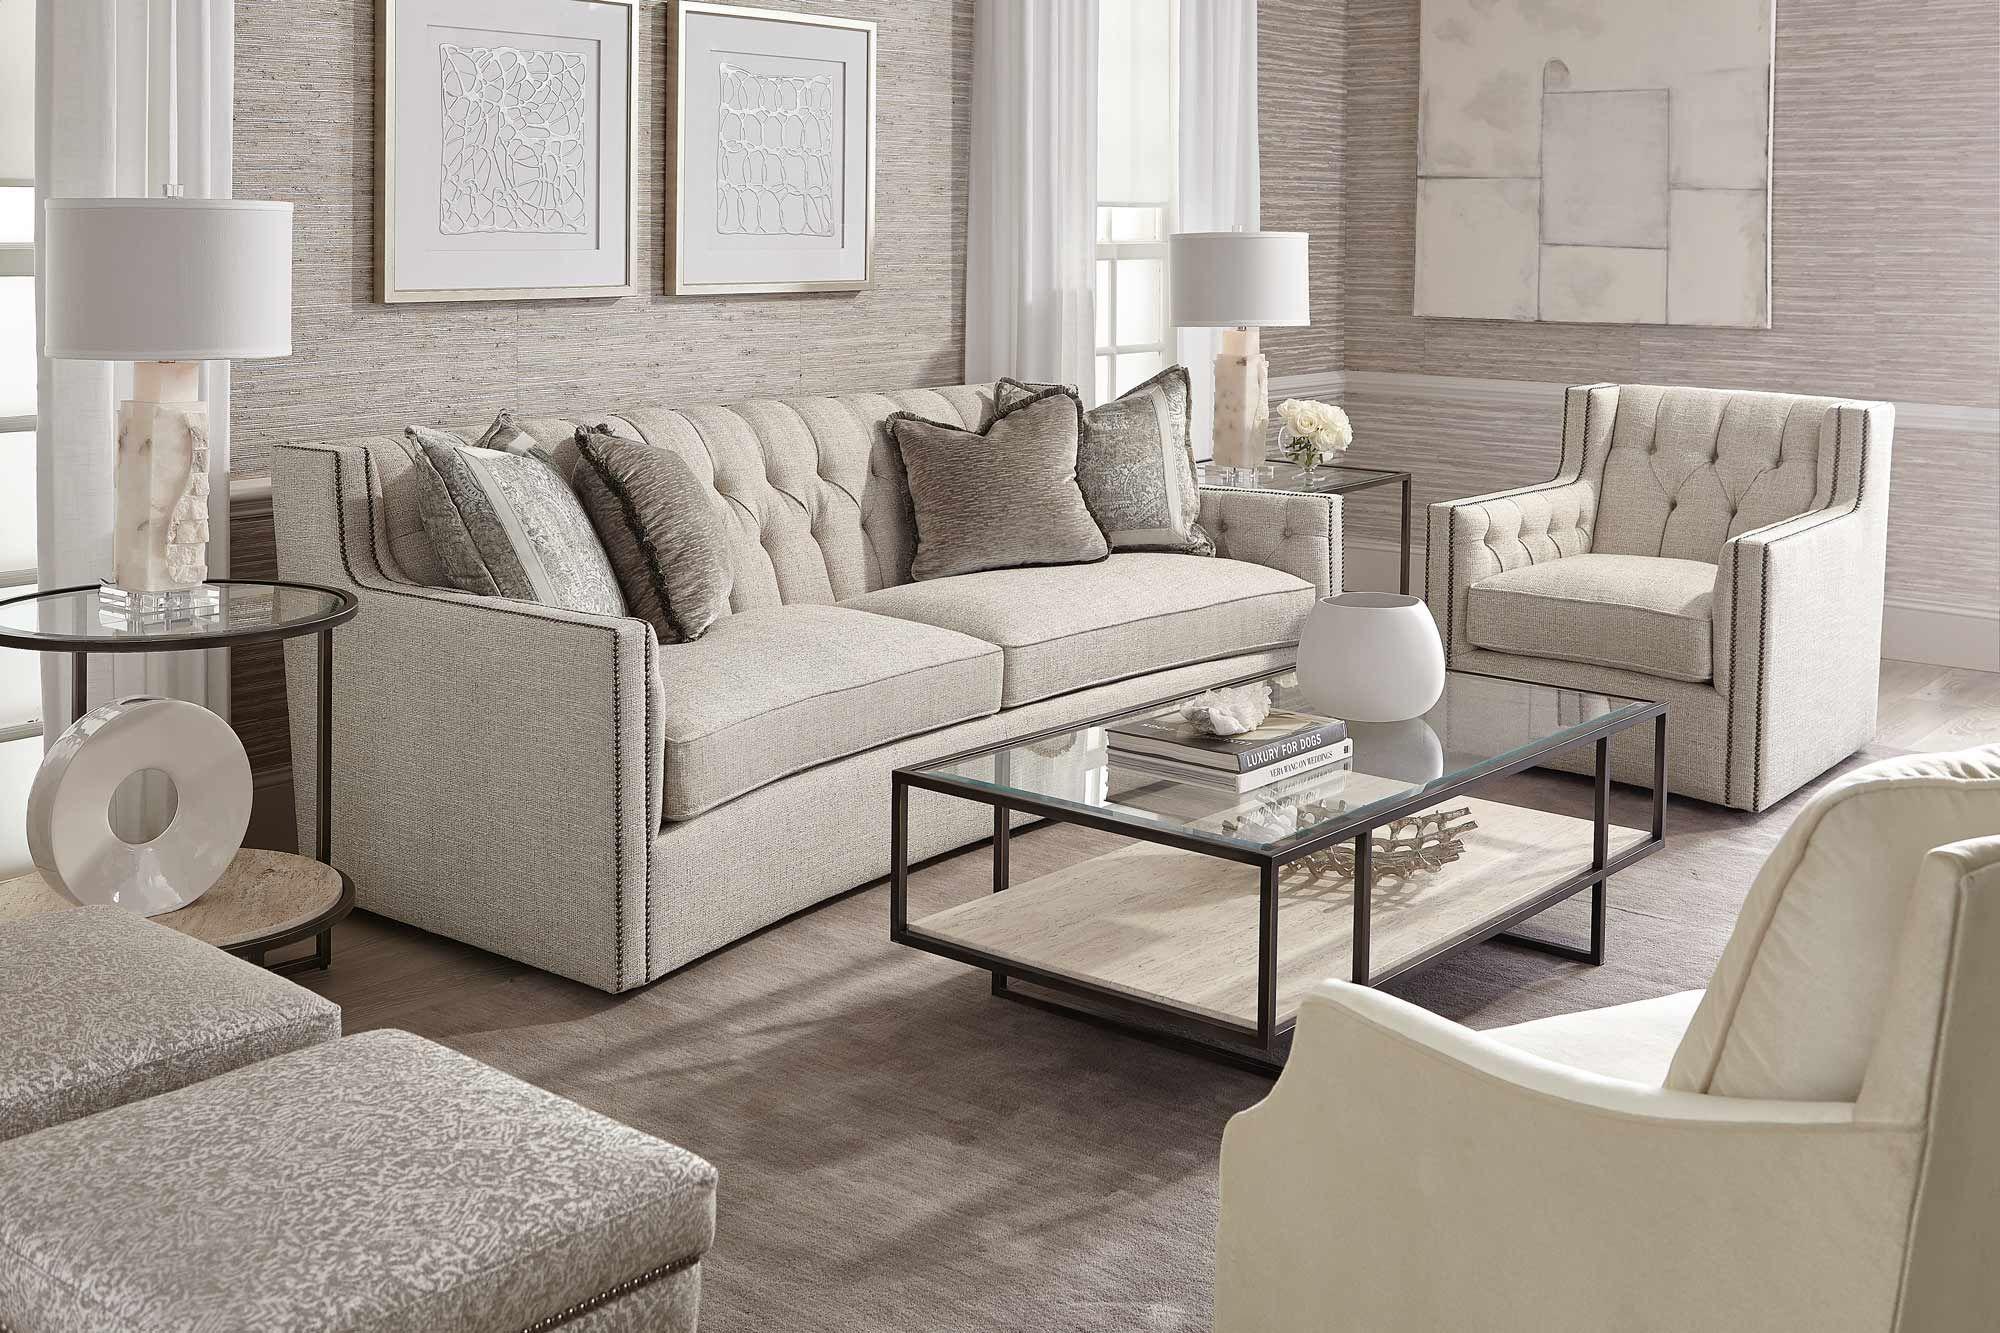 Caden Candace Remy Sabine Living Room Bernhardt Furniture Luxury Dining Tables Living Room Furniture [ 1333 x 2000 Pixel ]